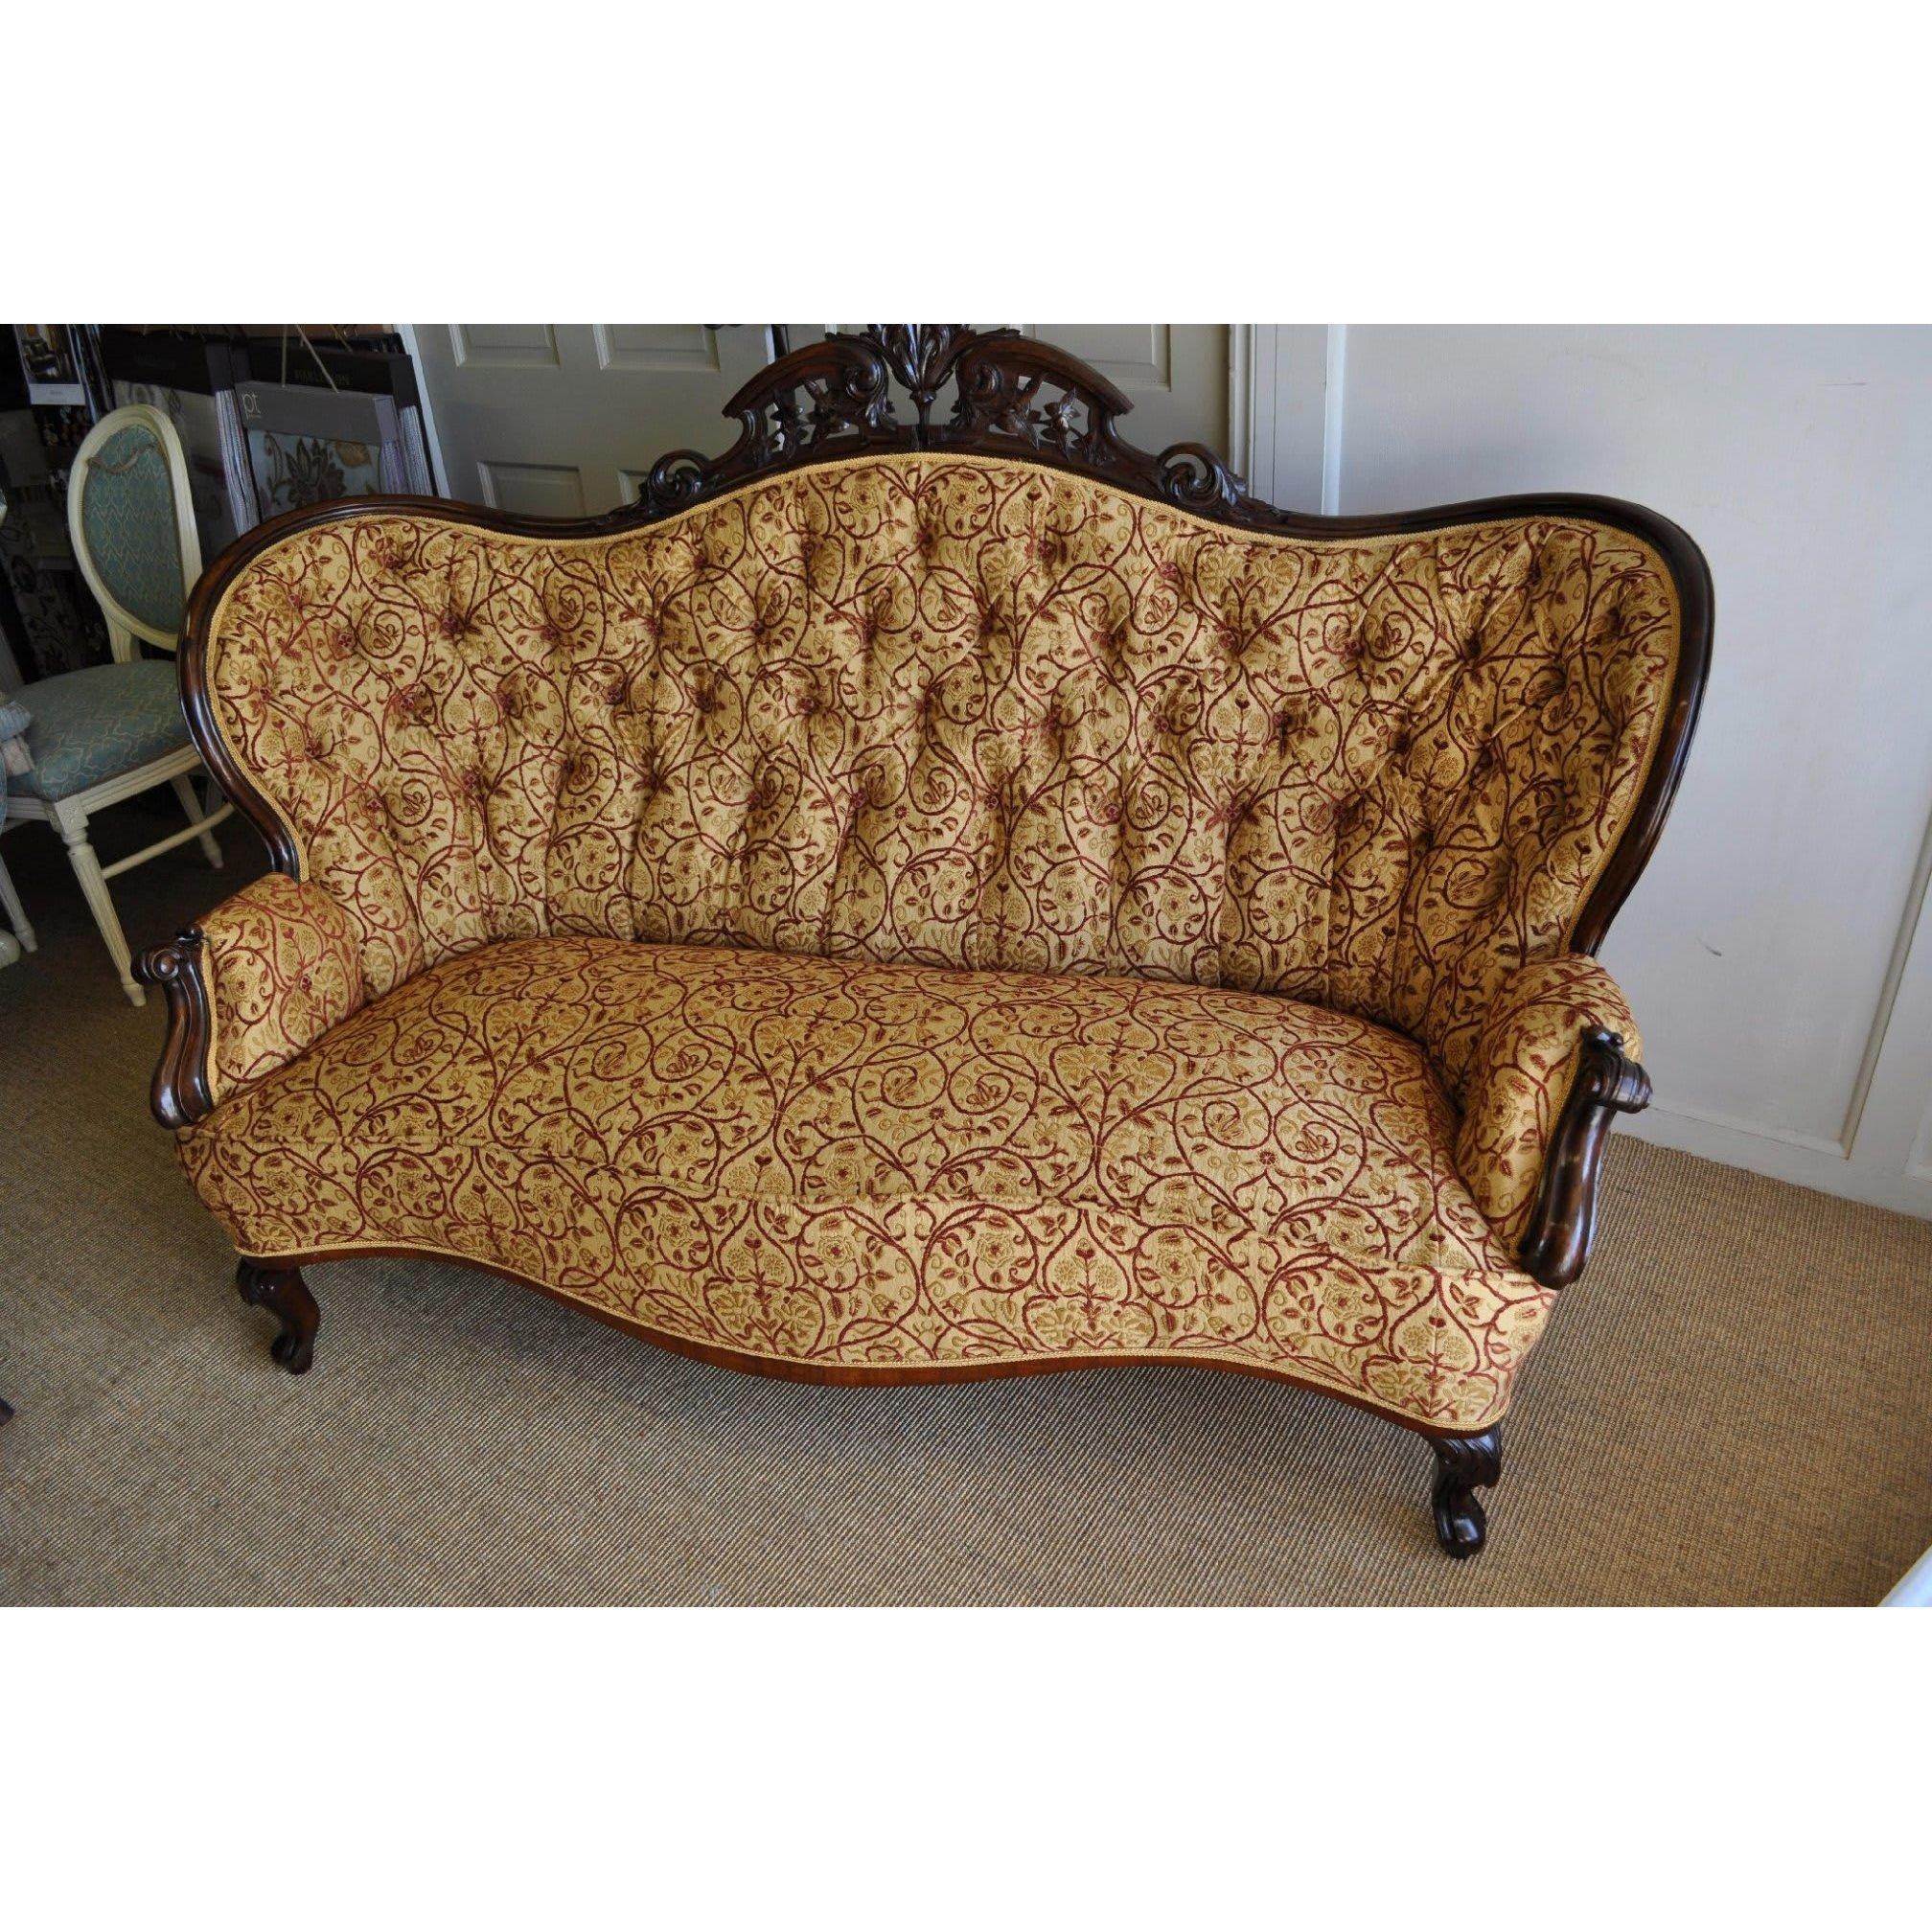 Glyn Smallwood Upholstery Ltd - Chesterfield, Derbyshire S43 4TT - 01246 573593 | ShowMeLocal.com